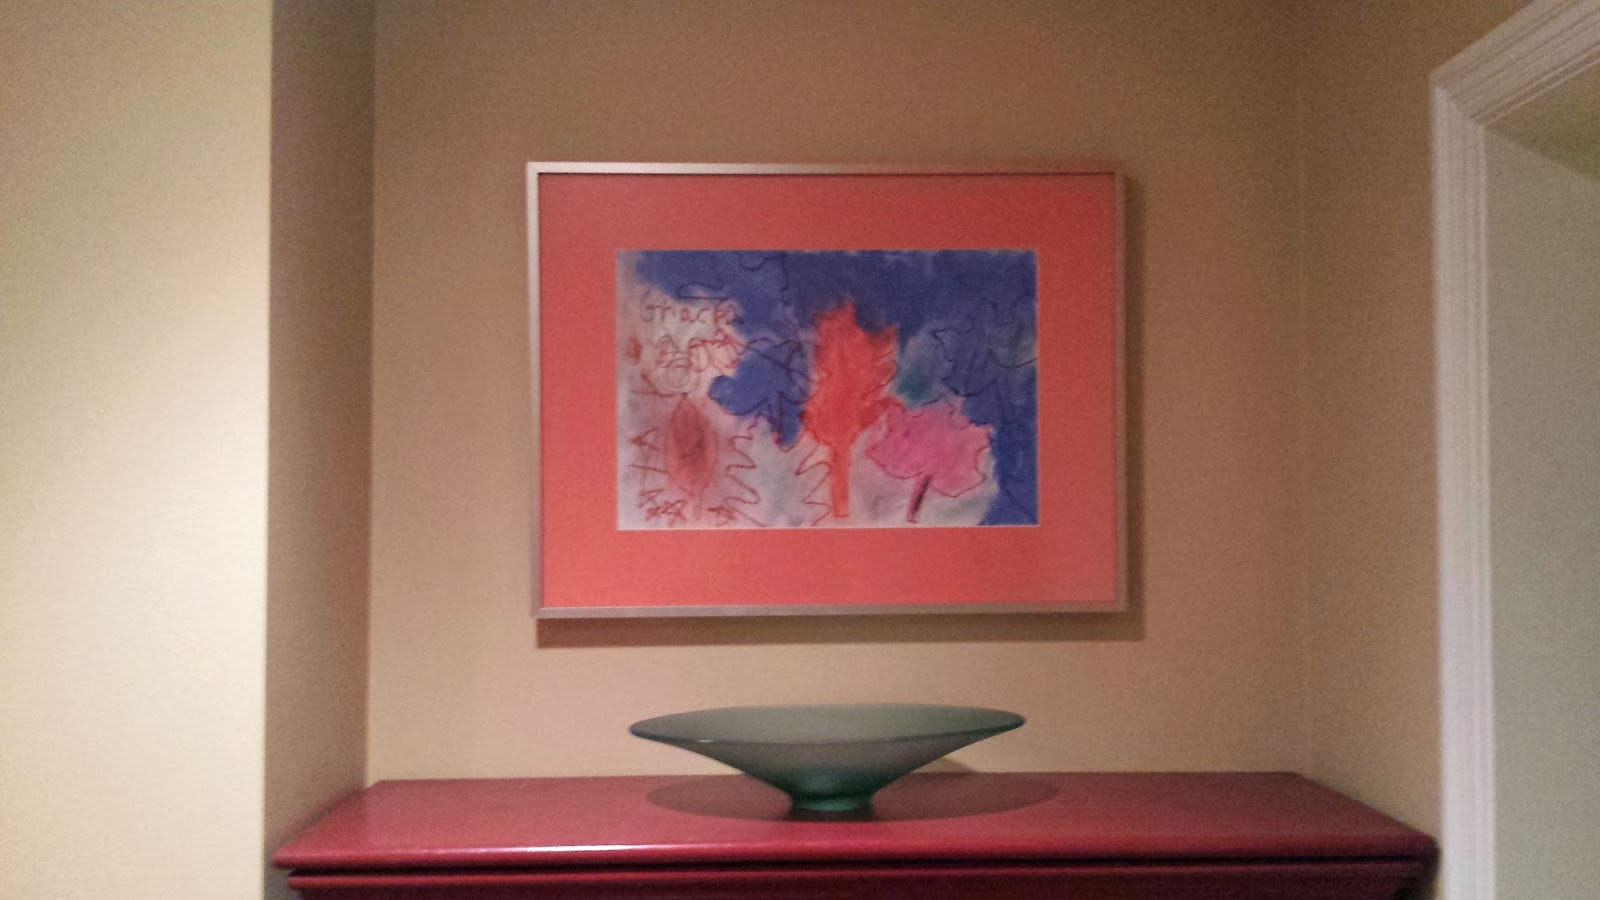 Picture Framing Blog - A Good Frame of Mind: Custom Framing Your ...